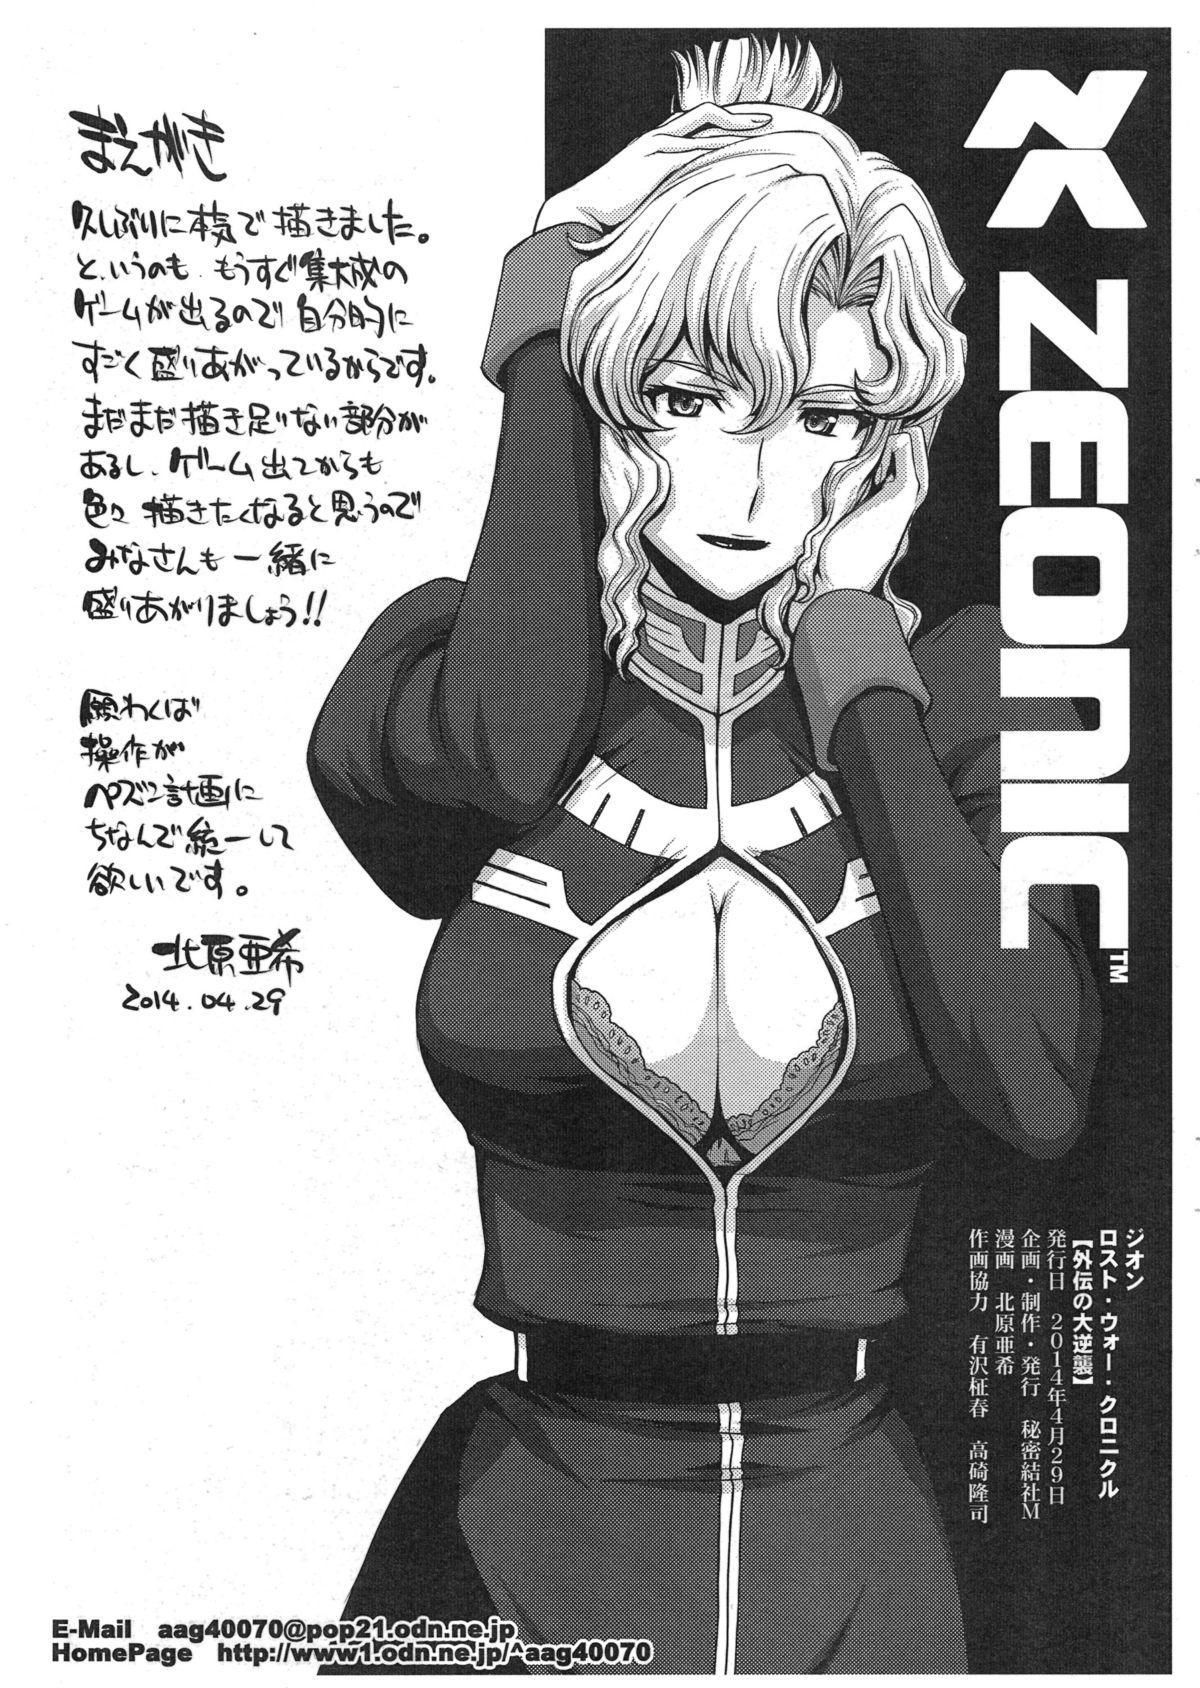 ZEON Lost War Chronicles - Gaiden no Daigyakushuu 2